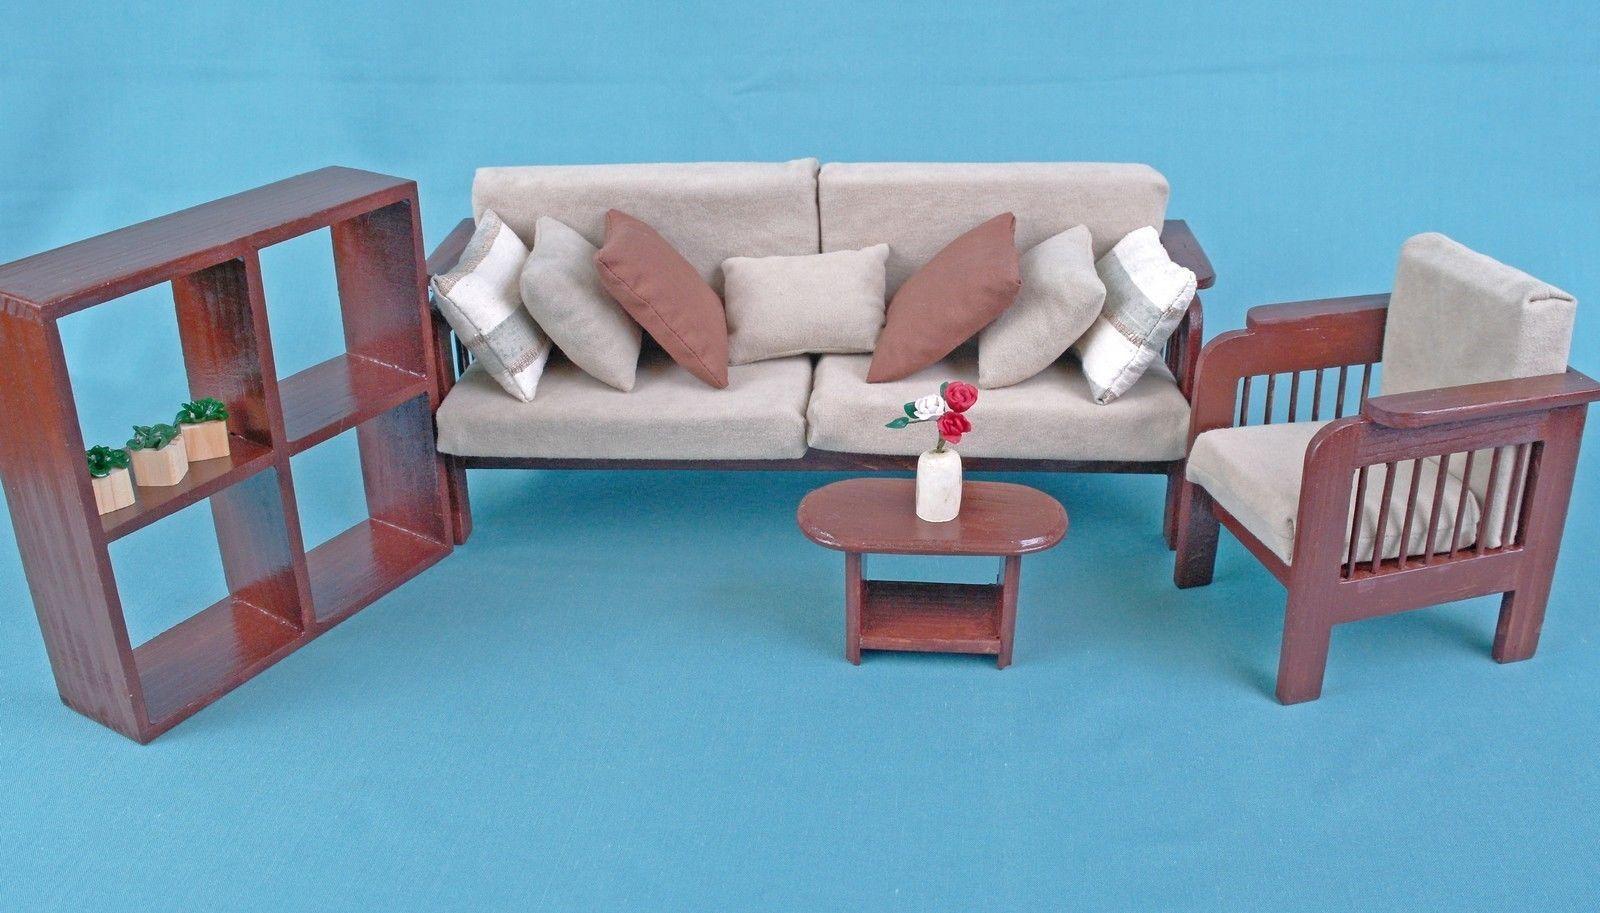 Living Room Marronee set Sofa Armchair  shelf coffeetable wooden bambolaHOUSE Furniture  tutti i beni sono speciali